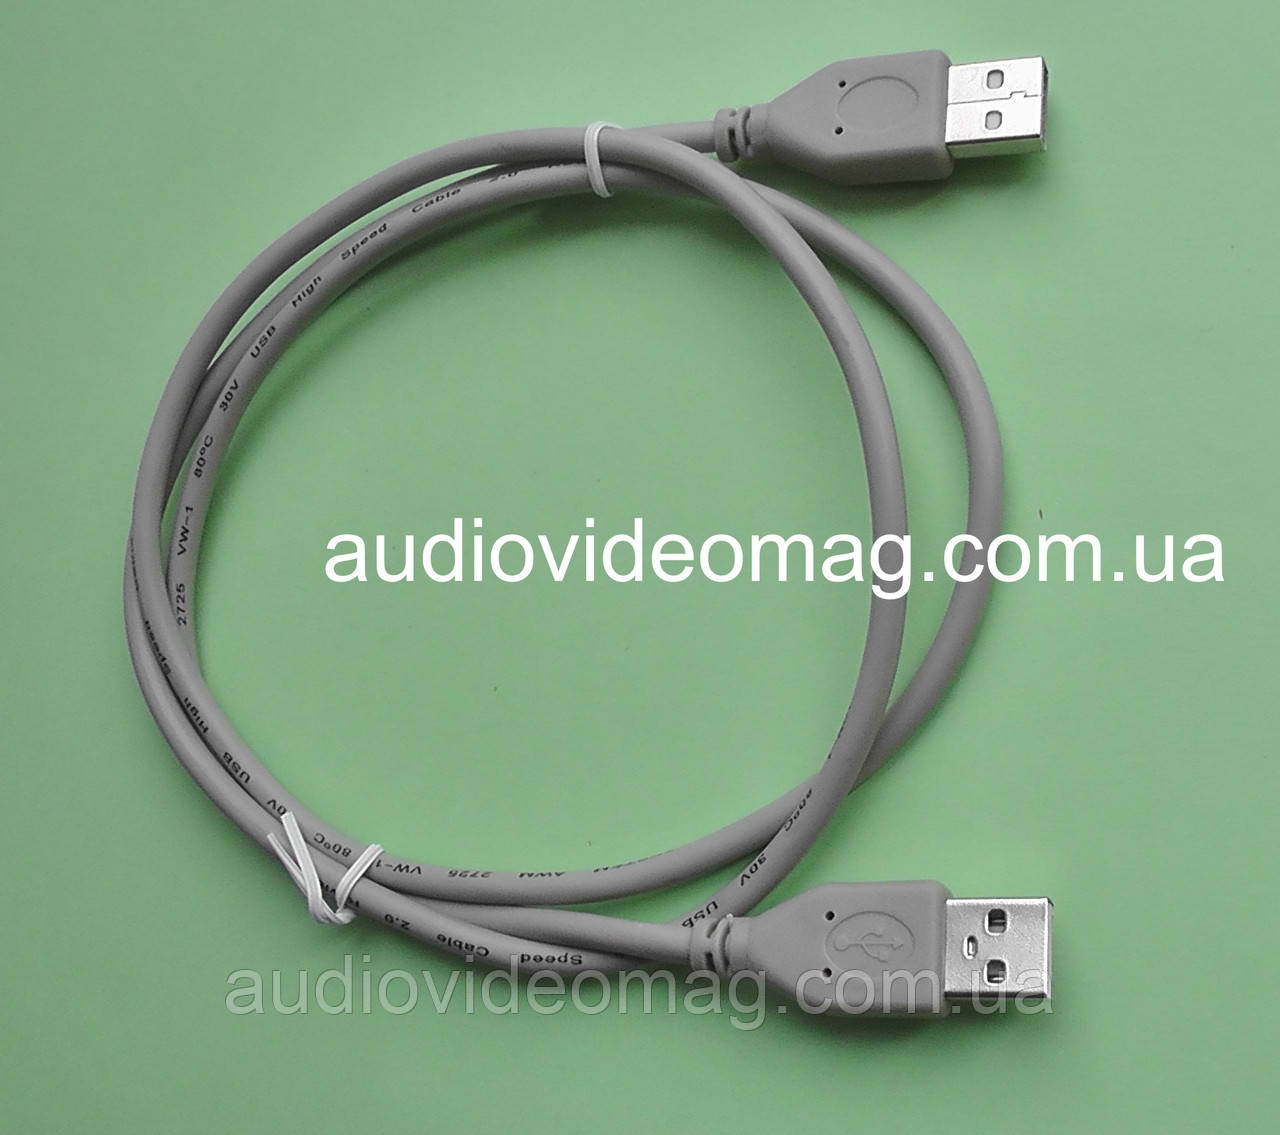 Кабель USB штекер-штекер , длина 1 метр